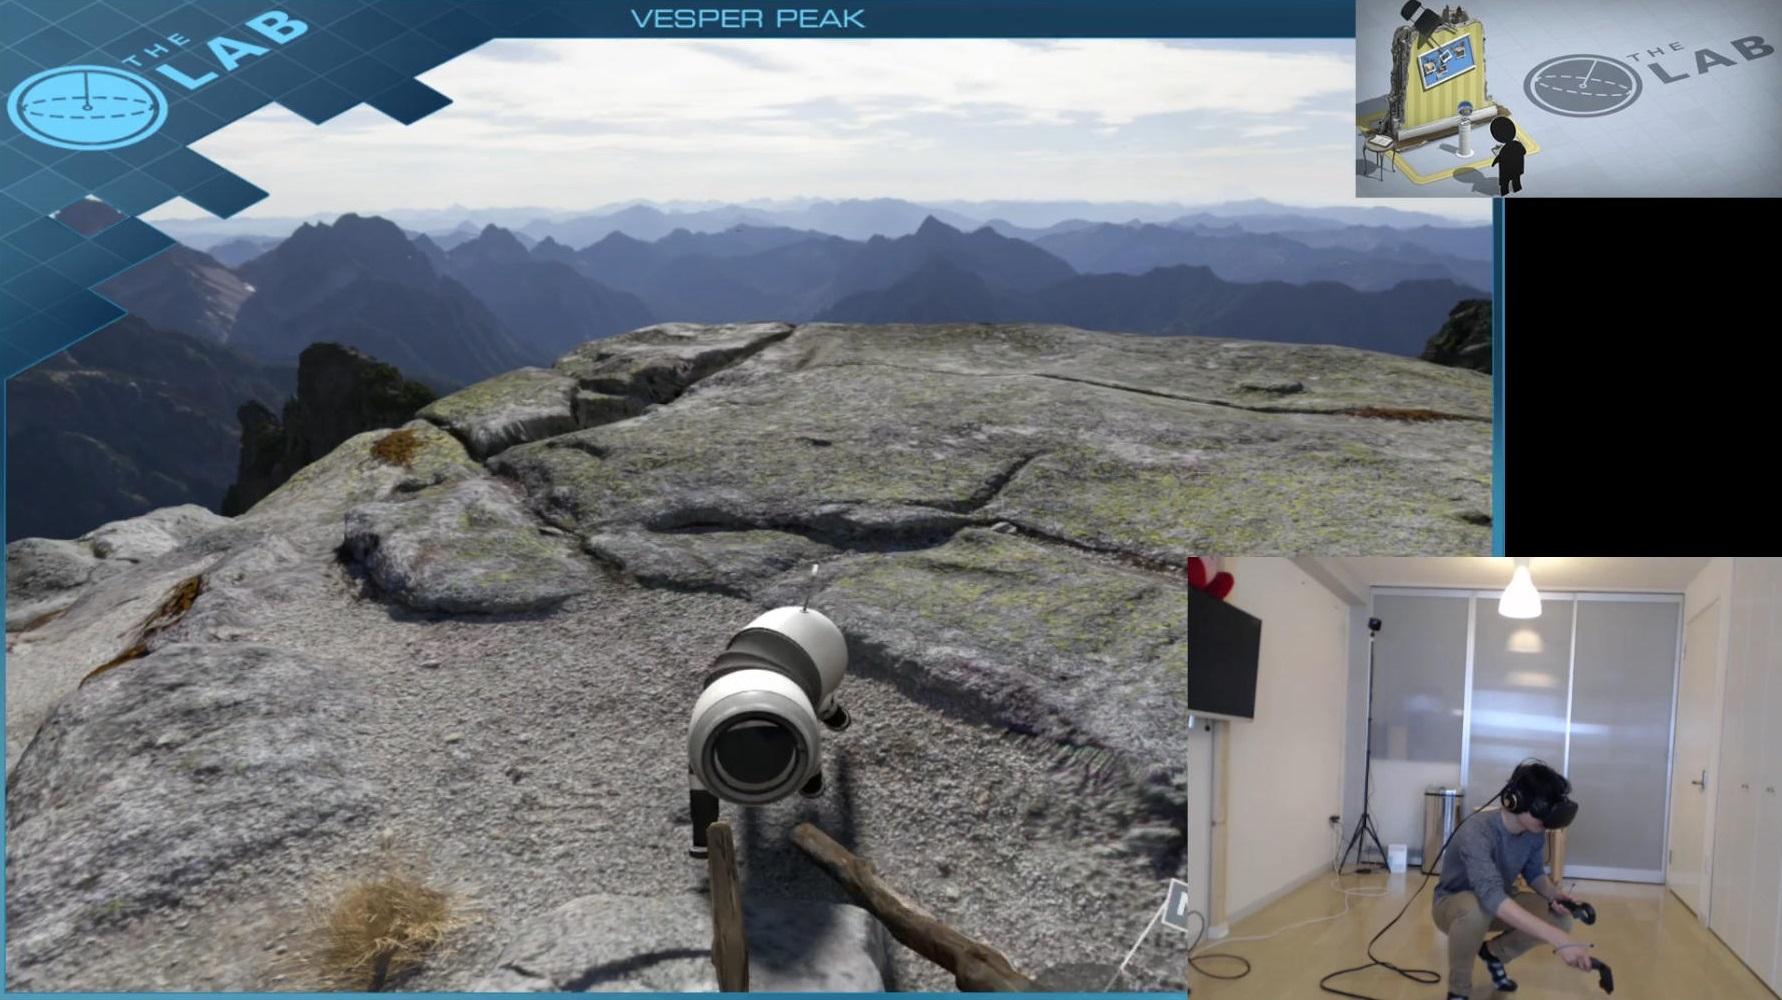 「Vesper Peak」では実写の風景の中を歩きまわり、ロボット犬とも戯れることができる